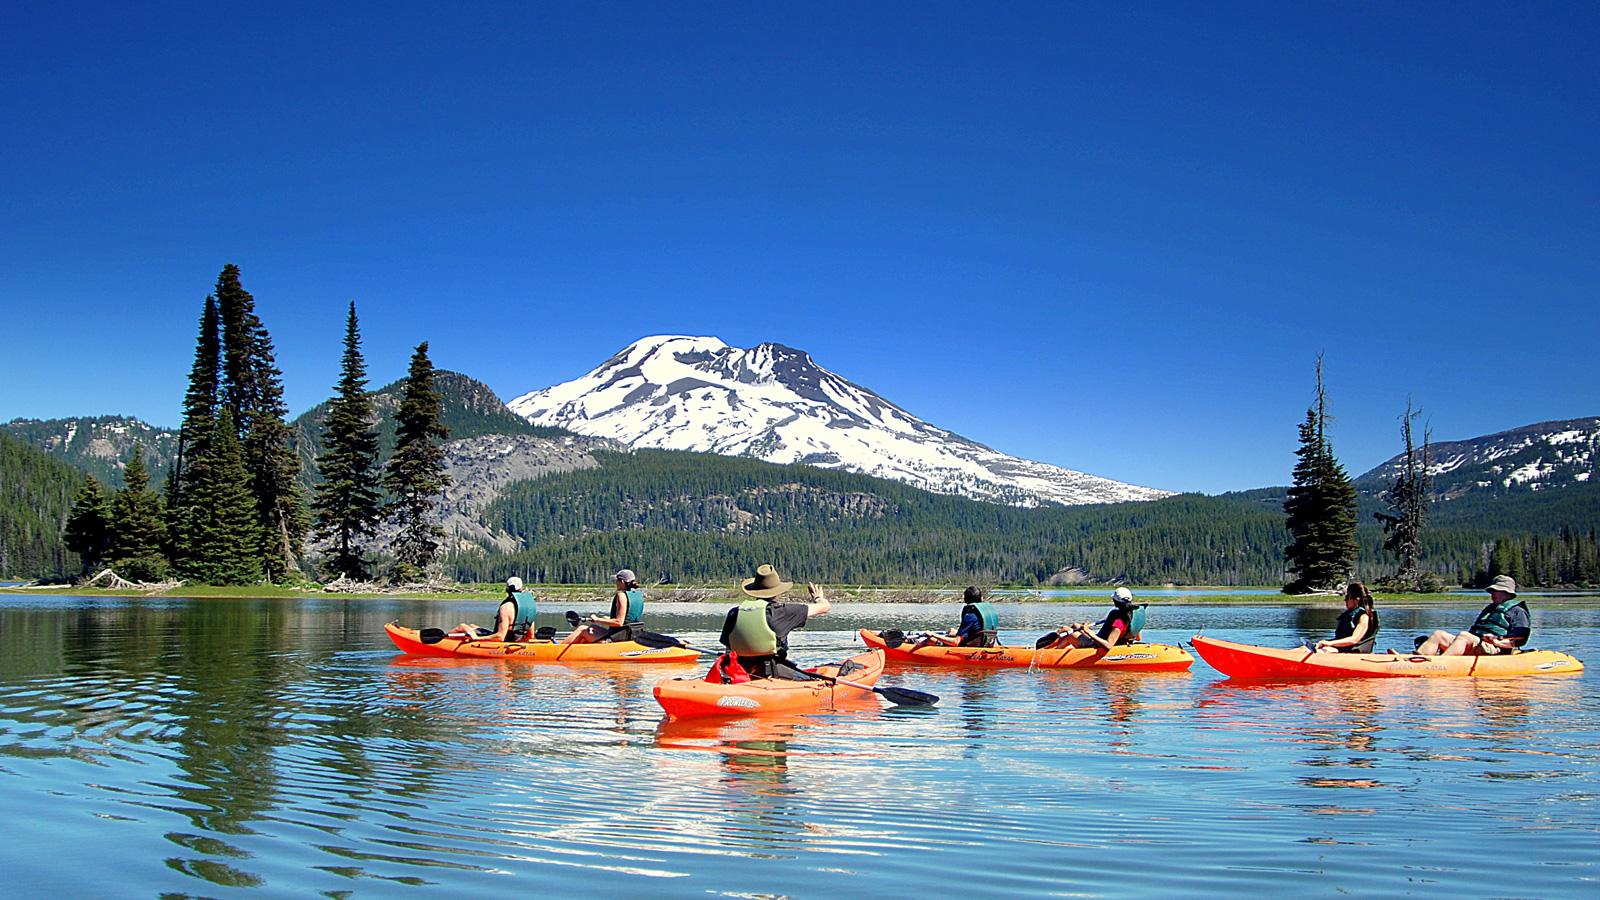 Cascades lake kayak tour from Wanderlust Tours in Bend, Oregon.